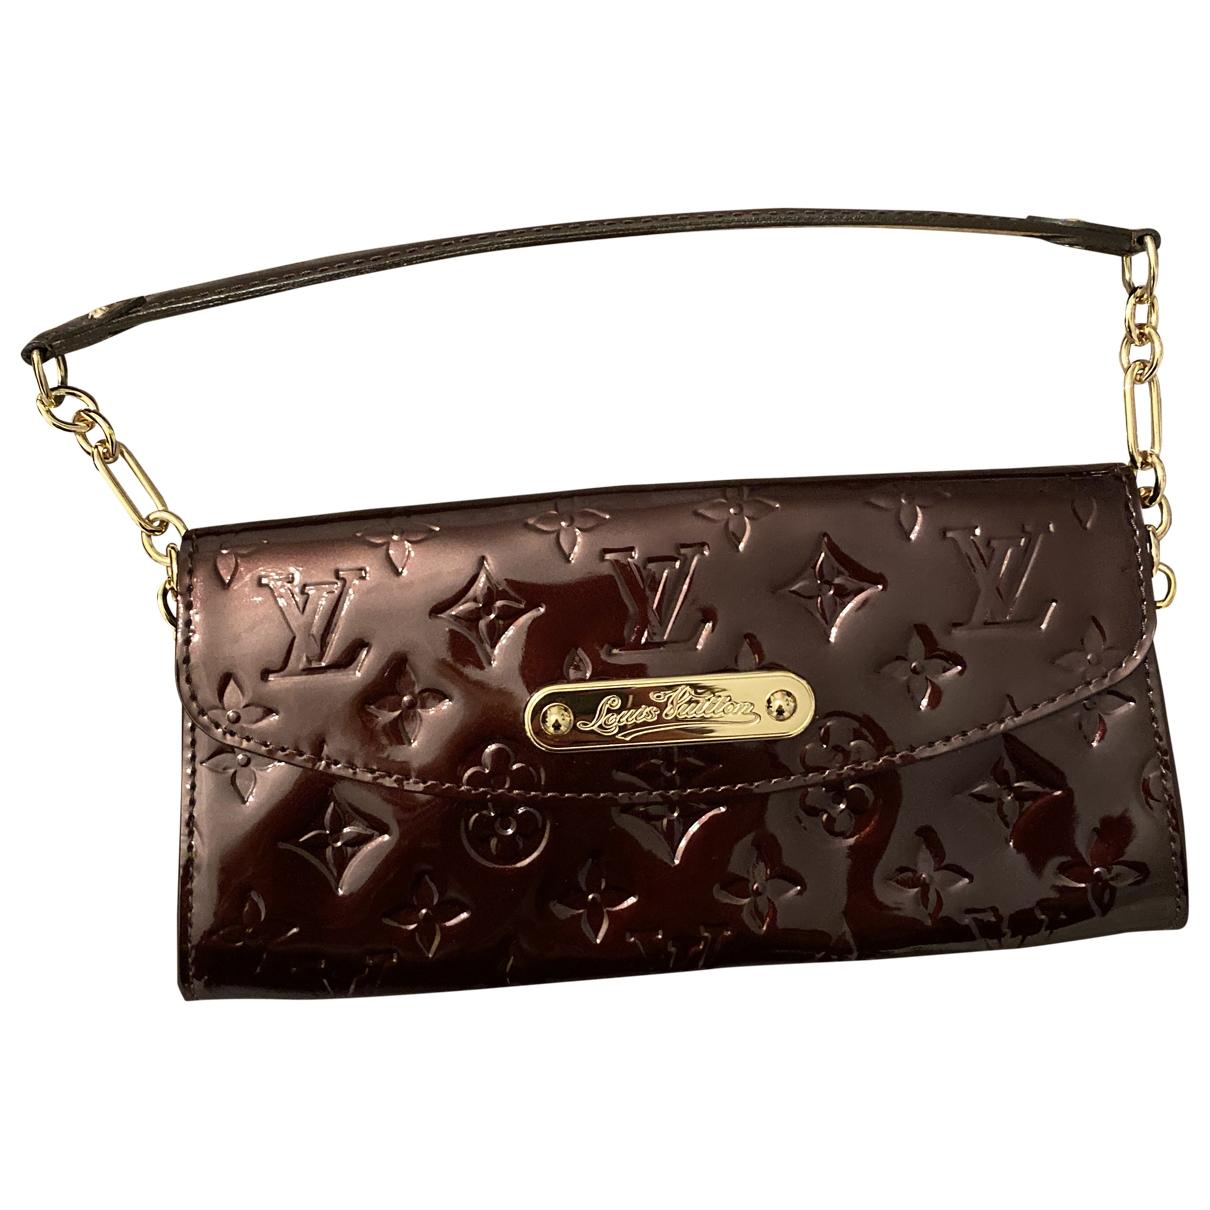 Louis Vuitton \N Burgundy Patent leather handbag for Women \N